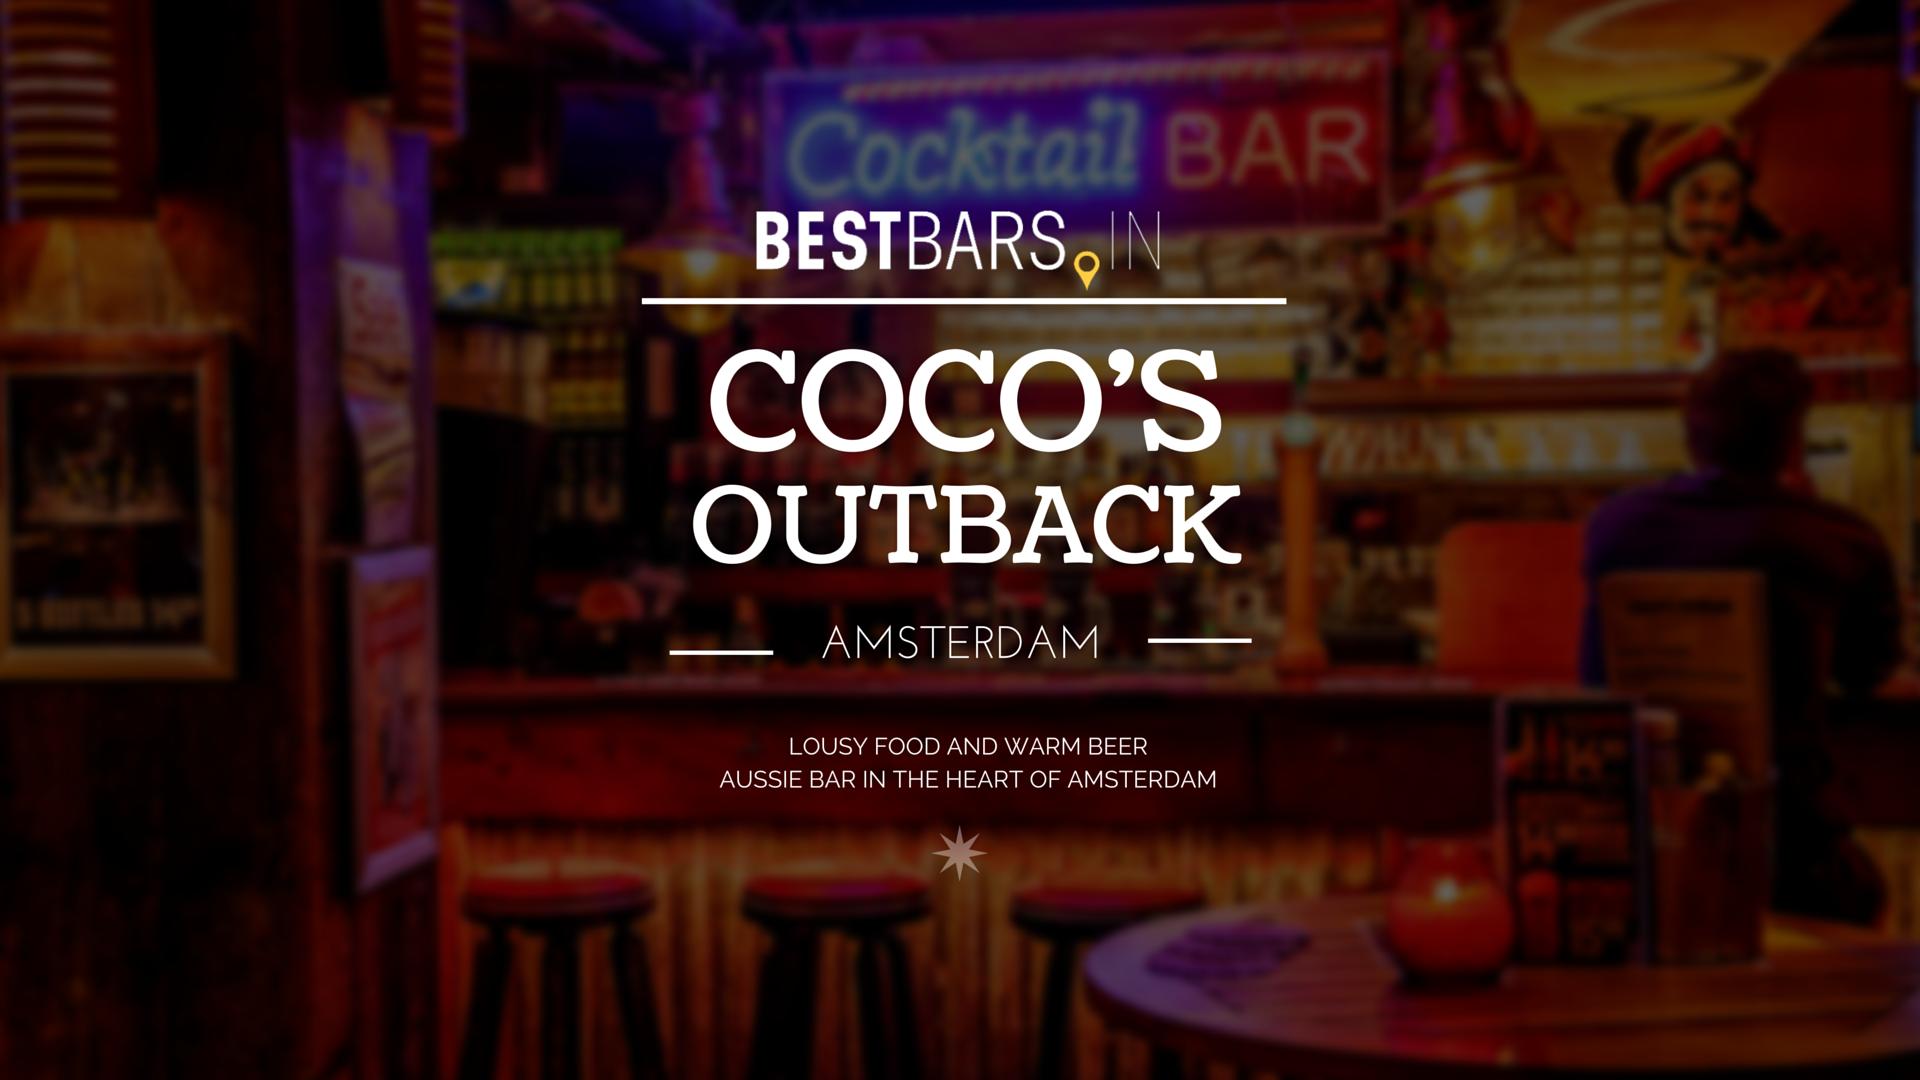 Coco's Outback - Australian bar in Amsterdam